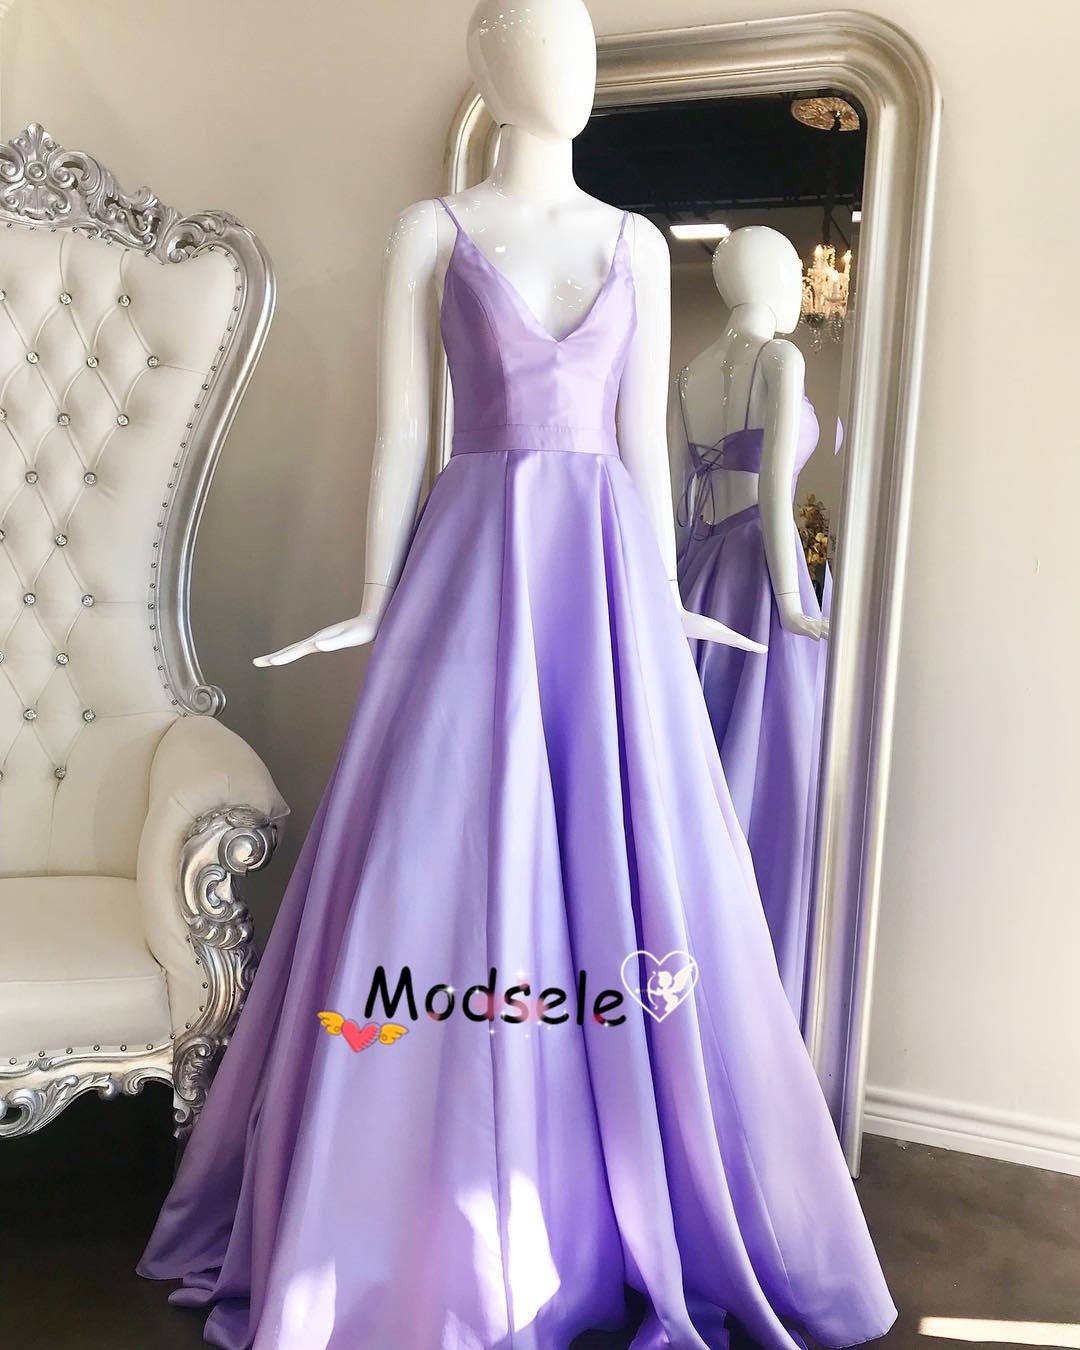 ed1f32bfb6f Elegant Lavender Long Prom Dress with Lace Up · modsele · Online ...